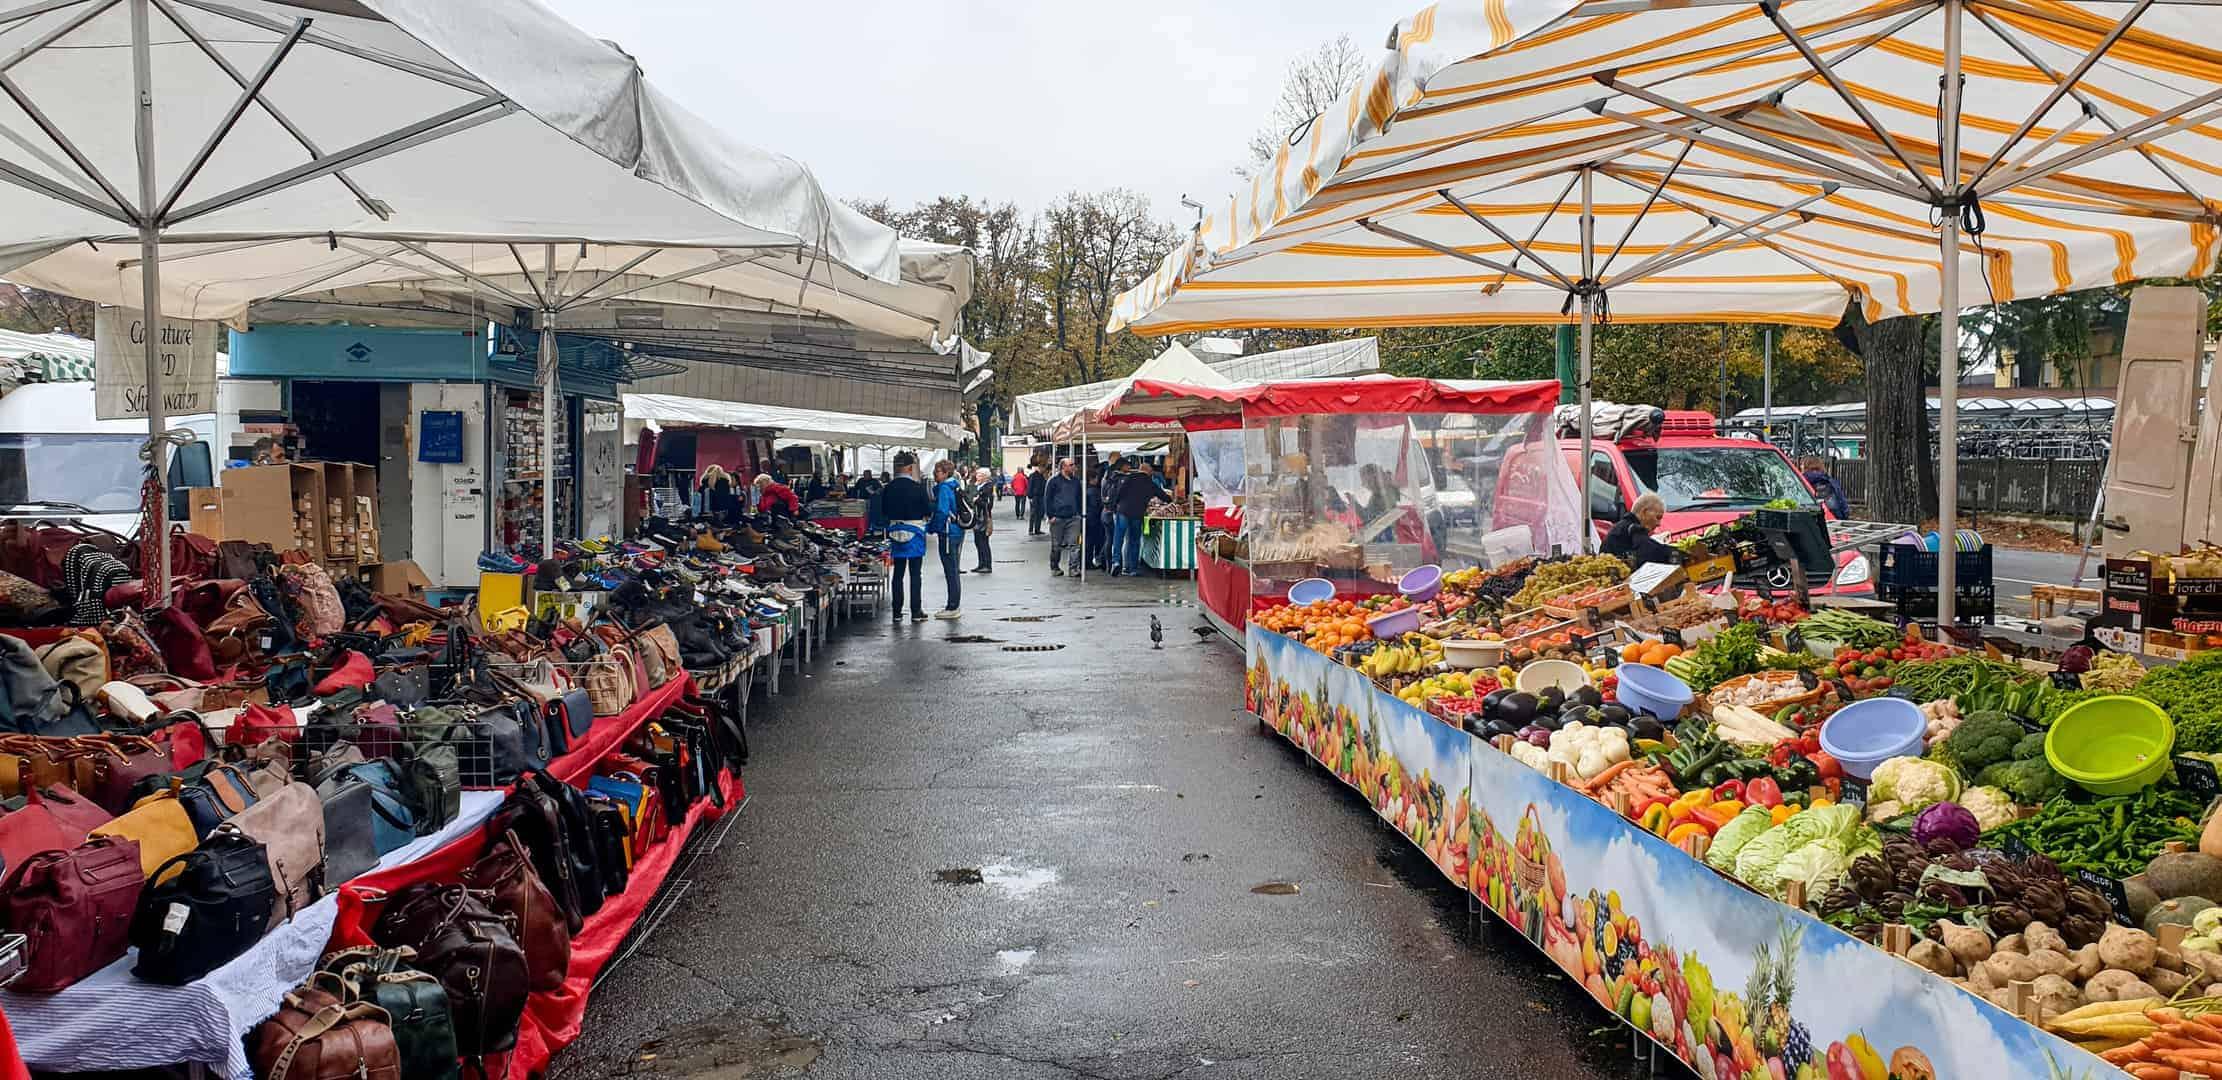 05_Südtirol_Meran_Markt-1